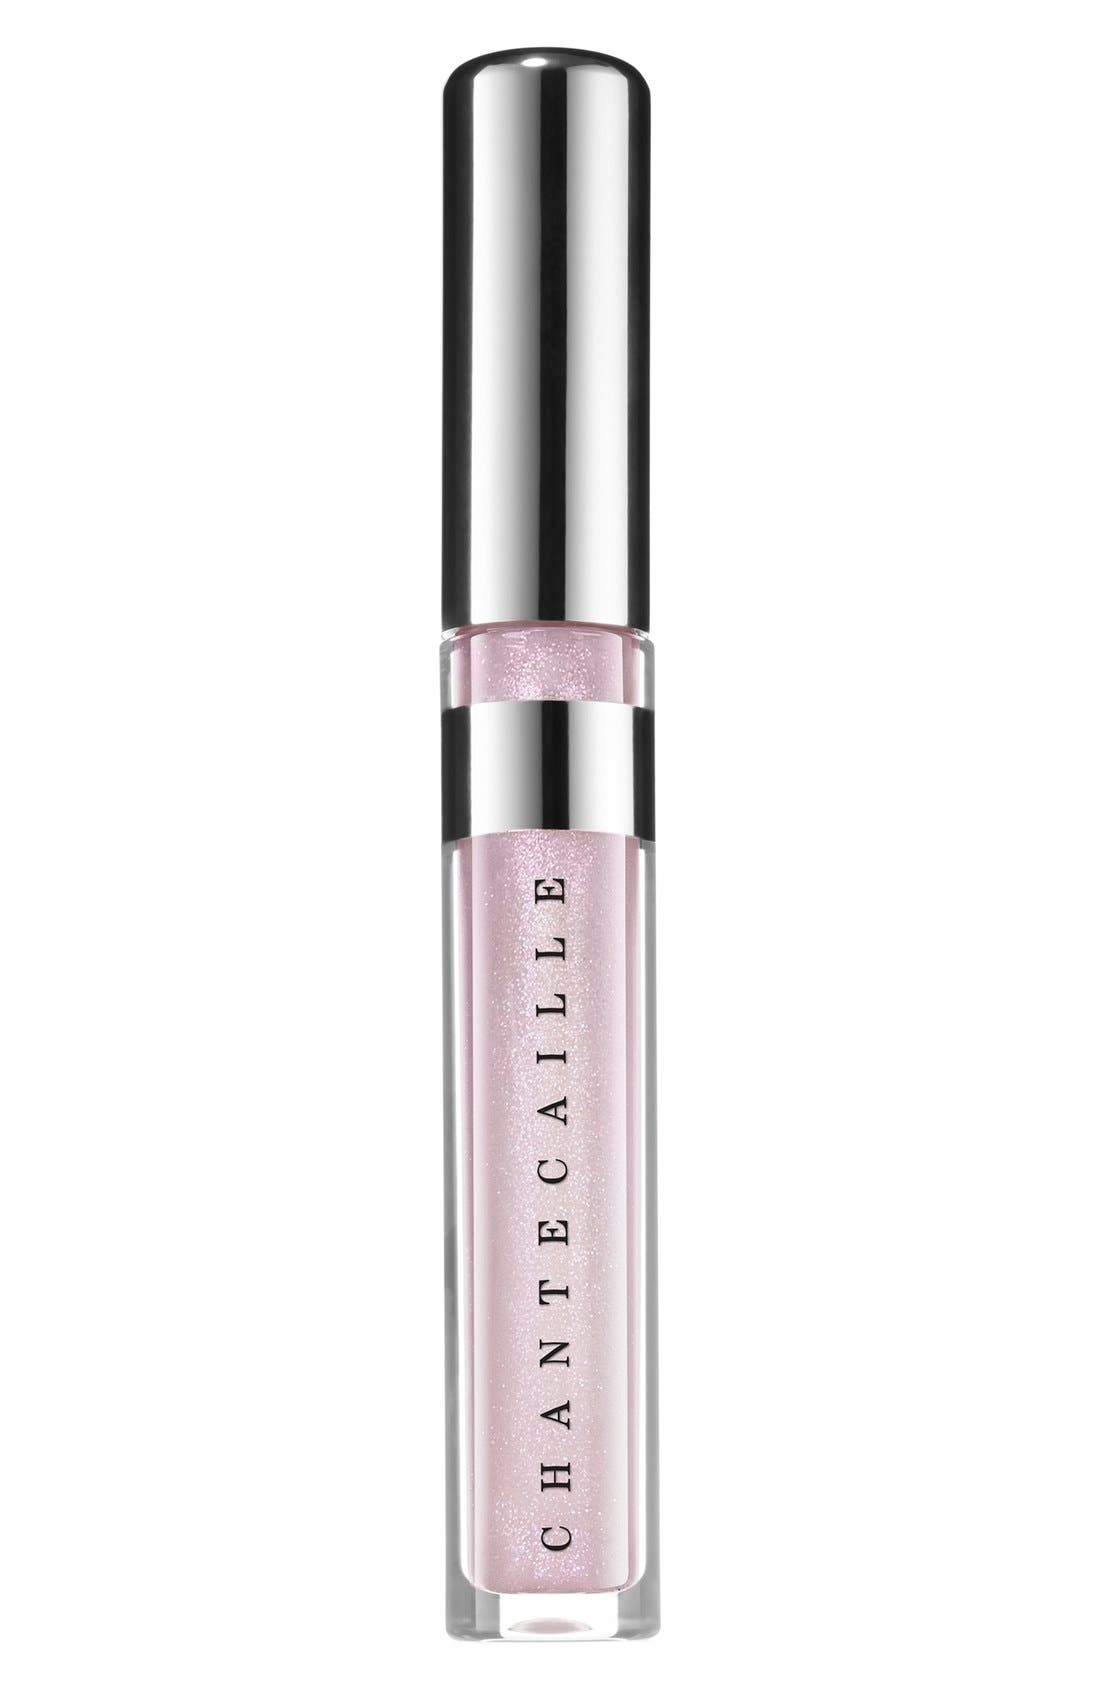 Chantecaille Galactic Lip Shine Healing Lip Gloss